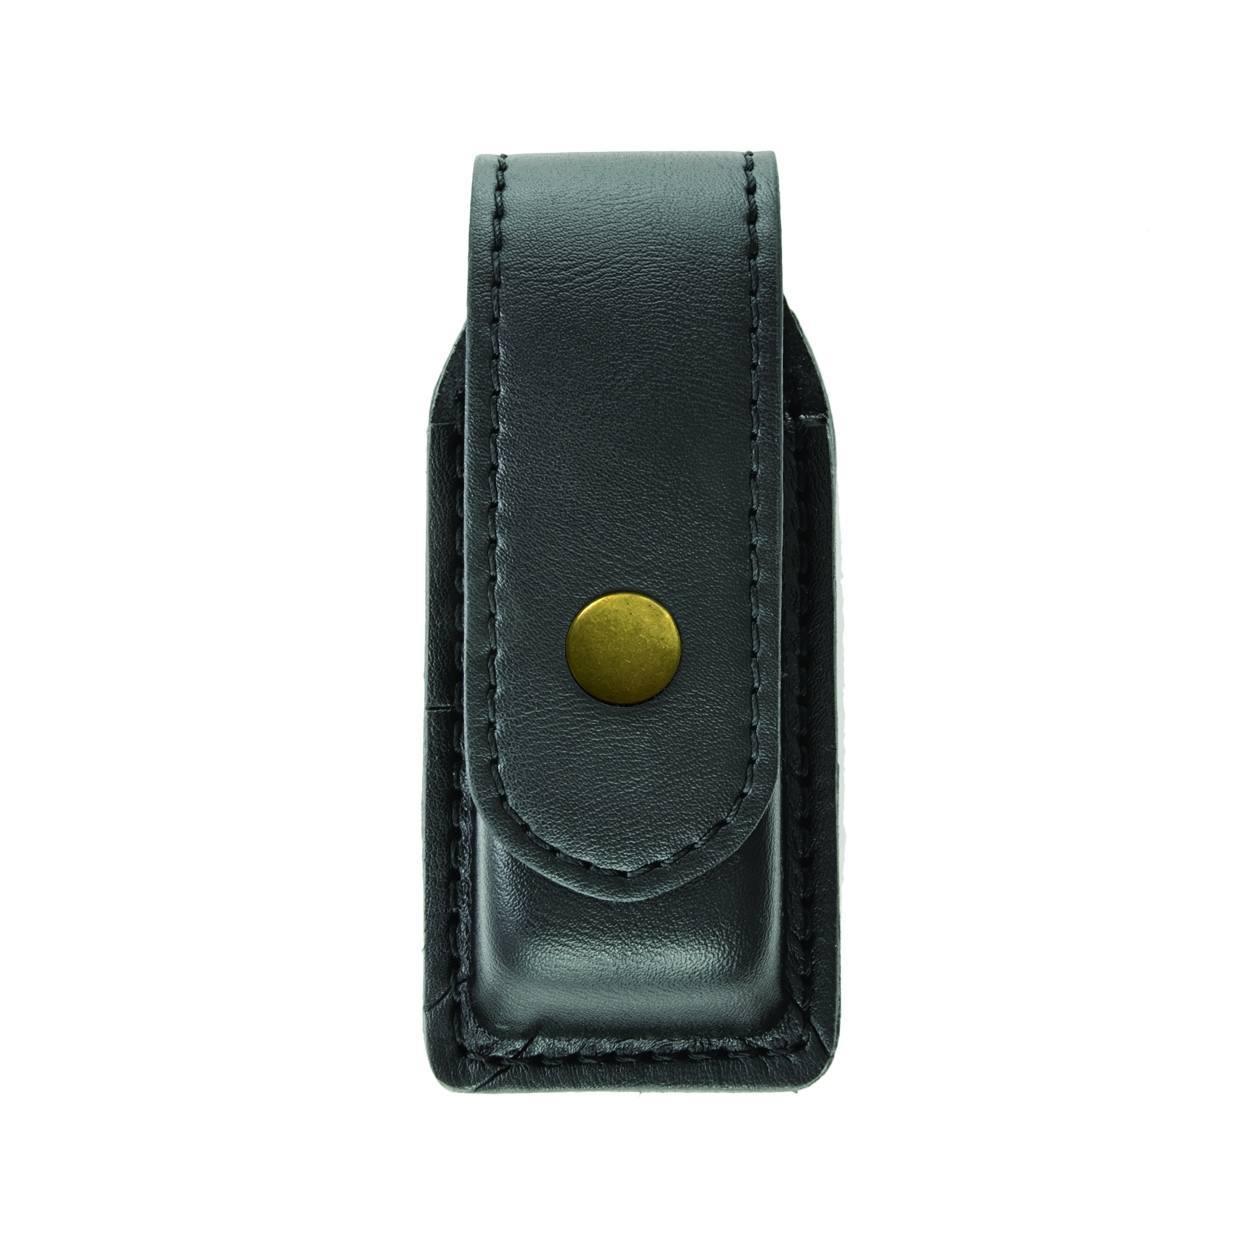 Single Magazine (or Knife) Case, Large, AirTek, Smooth, Brass Snap-